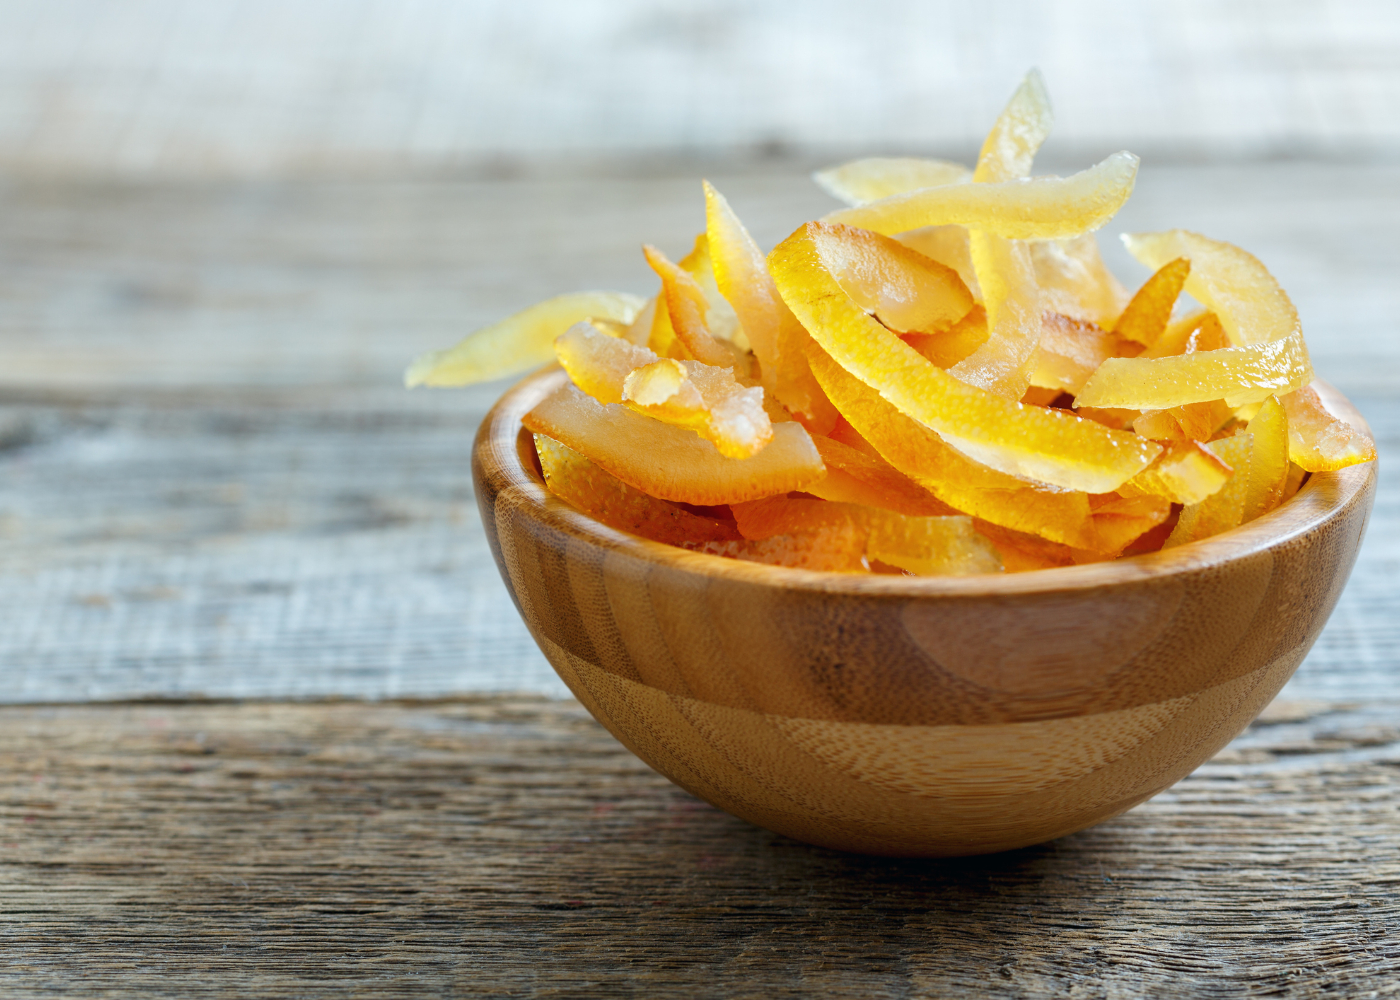 laranja cristalizada tigela fruta cristalizada